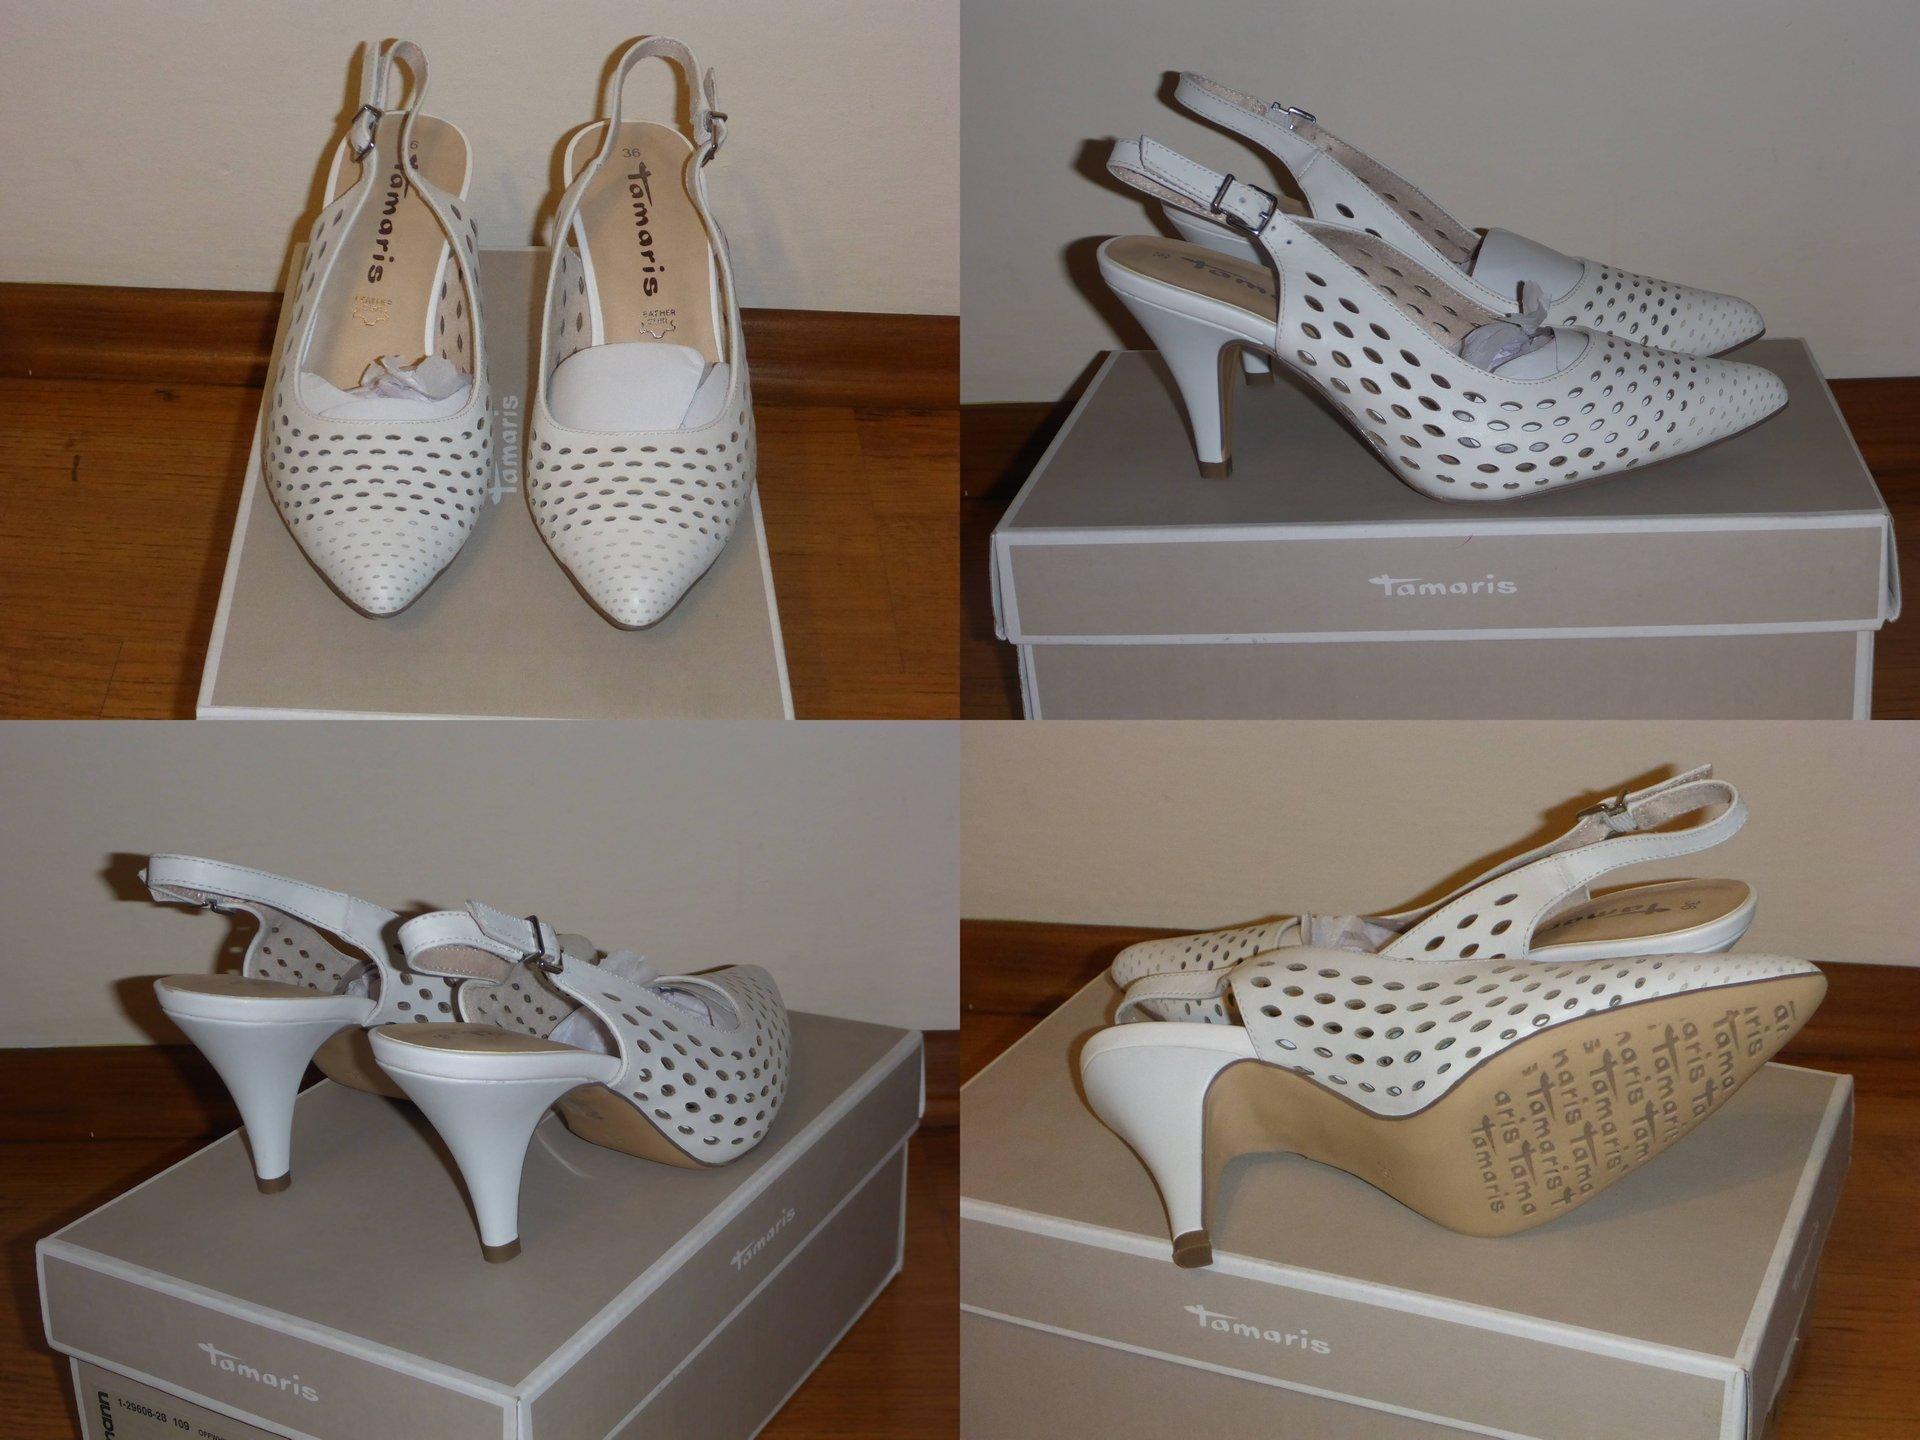 Nowe sandały na obcasie TAMARIS - Arabela offwhite